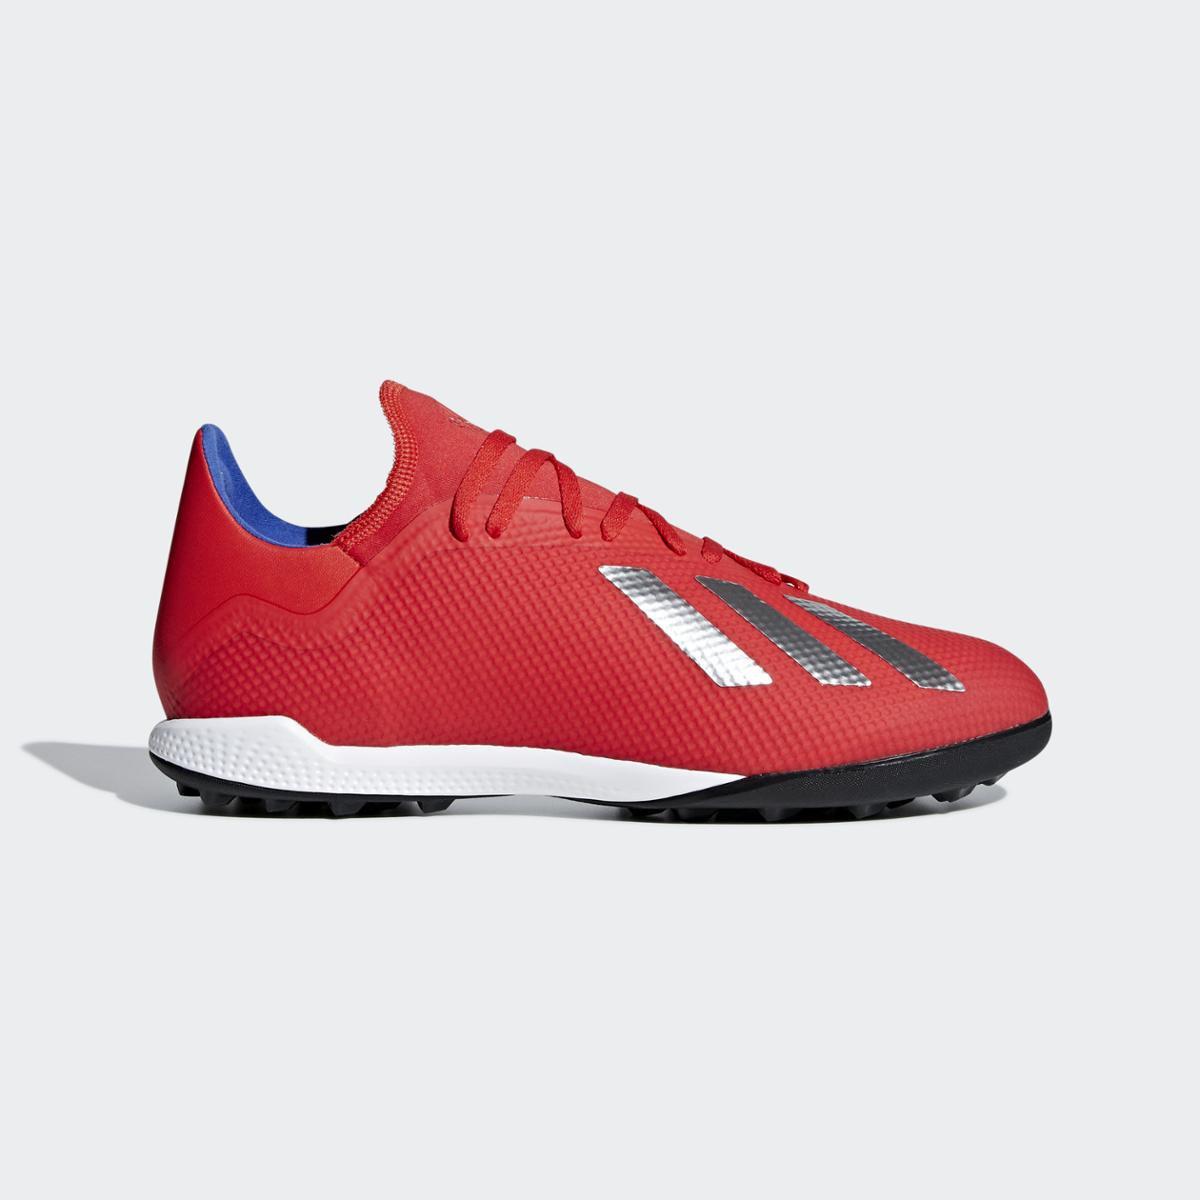 453e21c822 Chuteira Society X Tango 18.3 Adidas